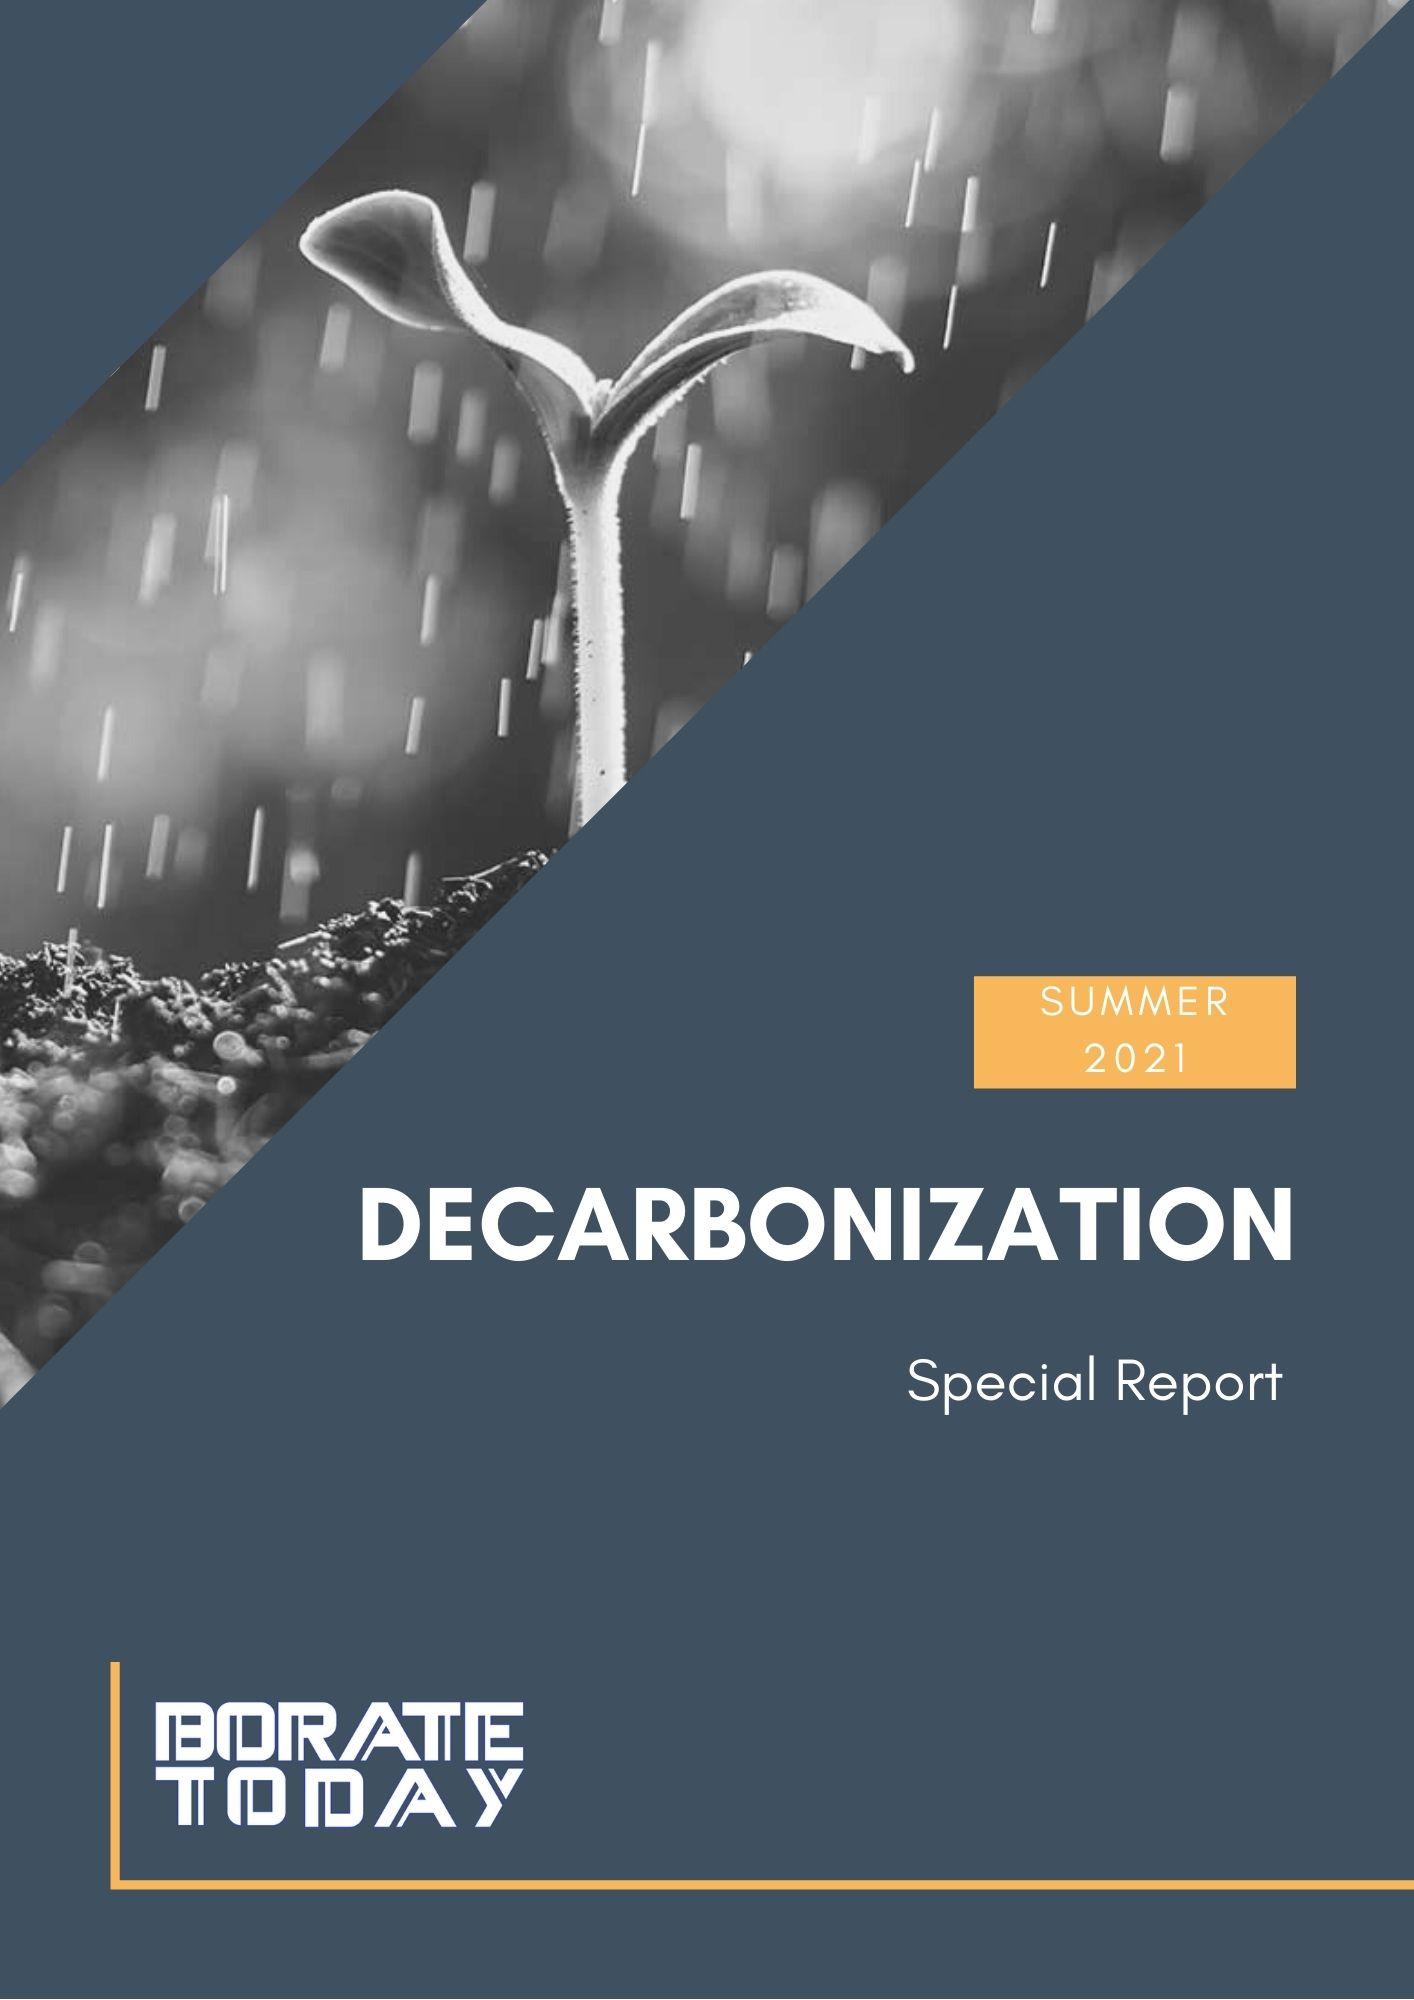 Decarbonization – Special Report